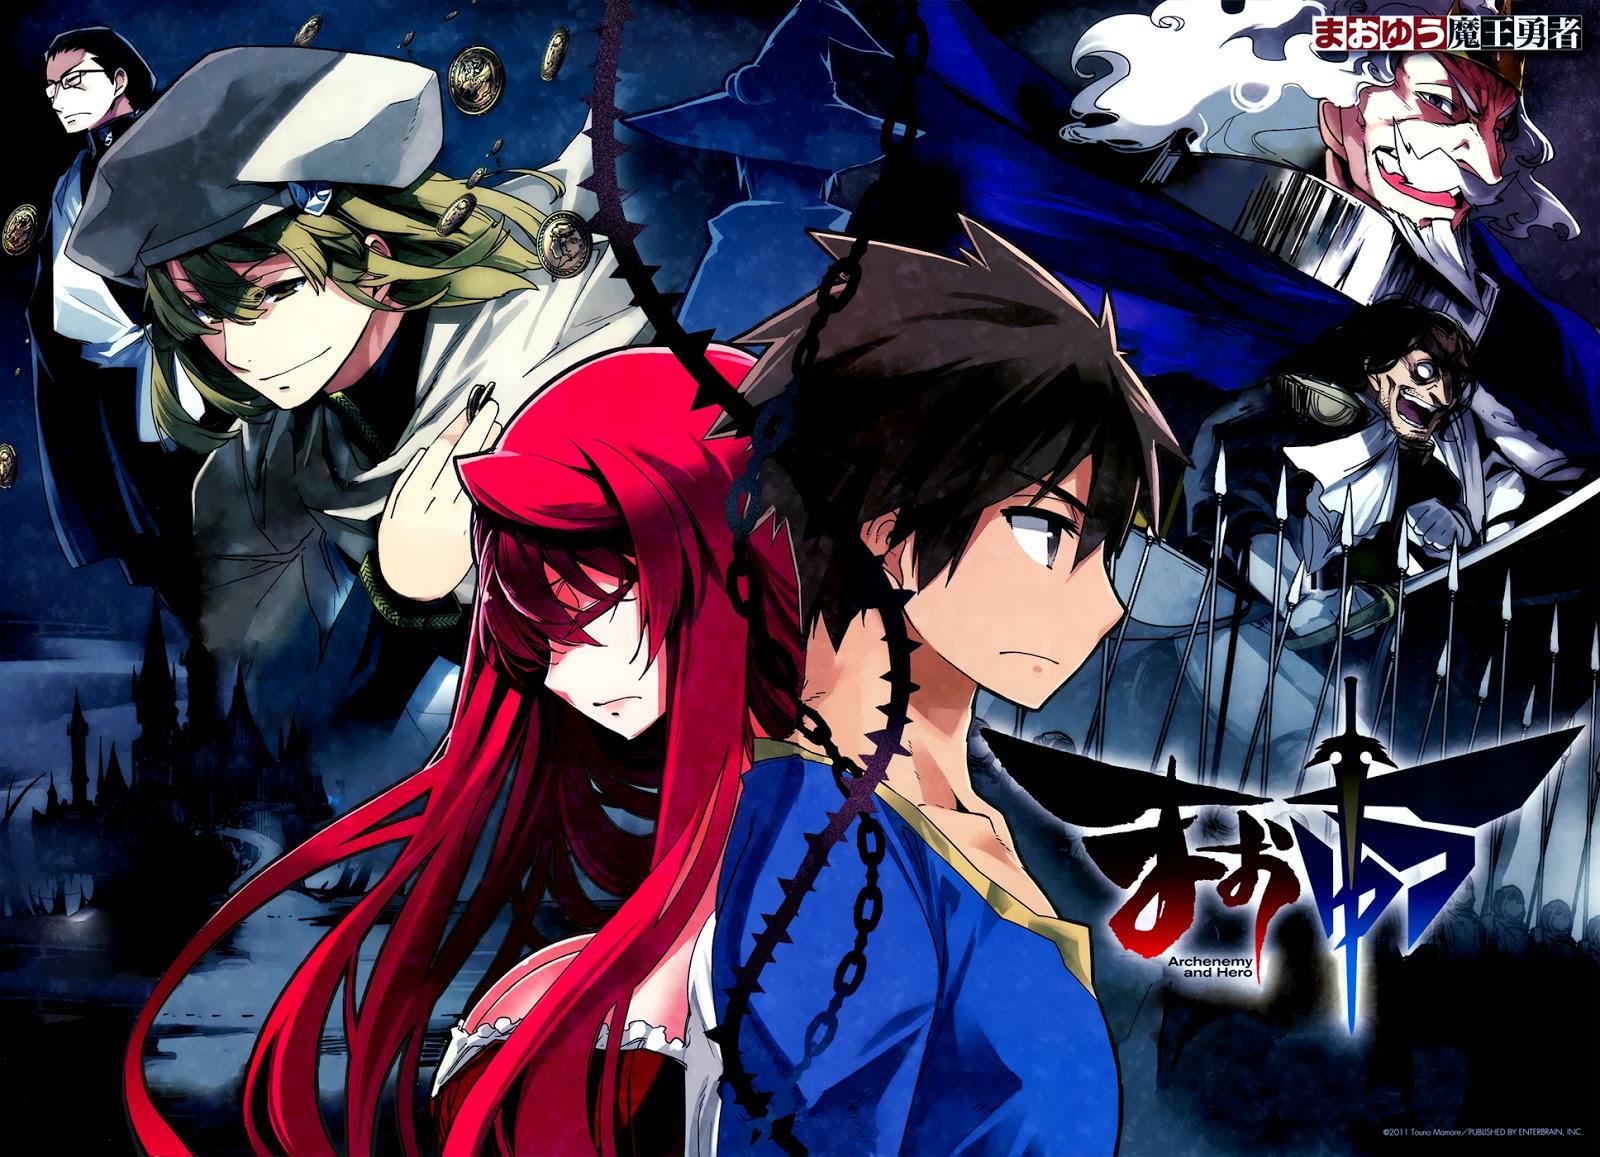 monogatari series episode 1 english dub